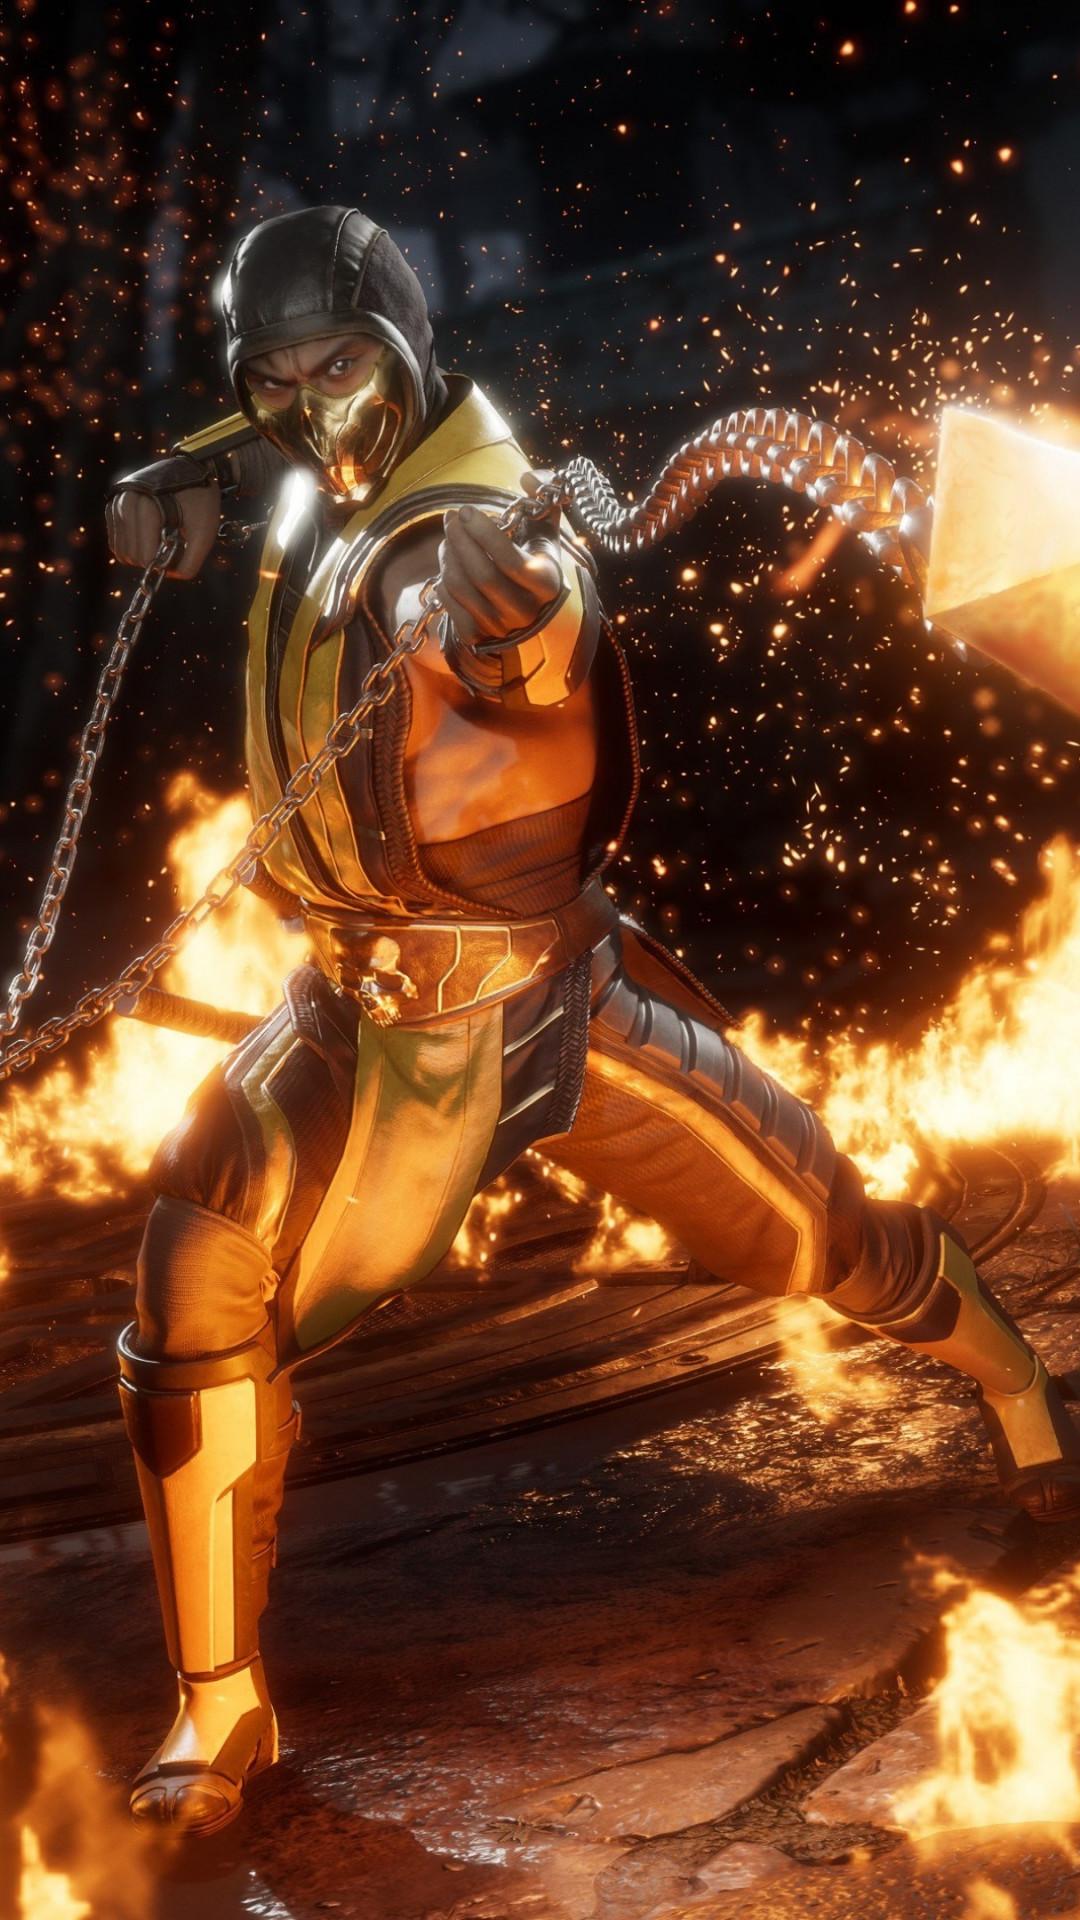 Download Wallpaper Mortal Kombat 11 Scorpion 1080x1920